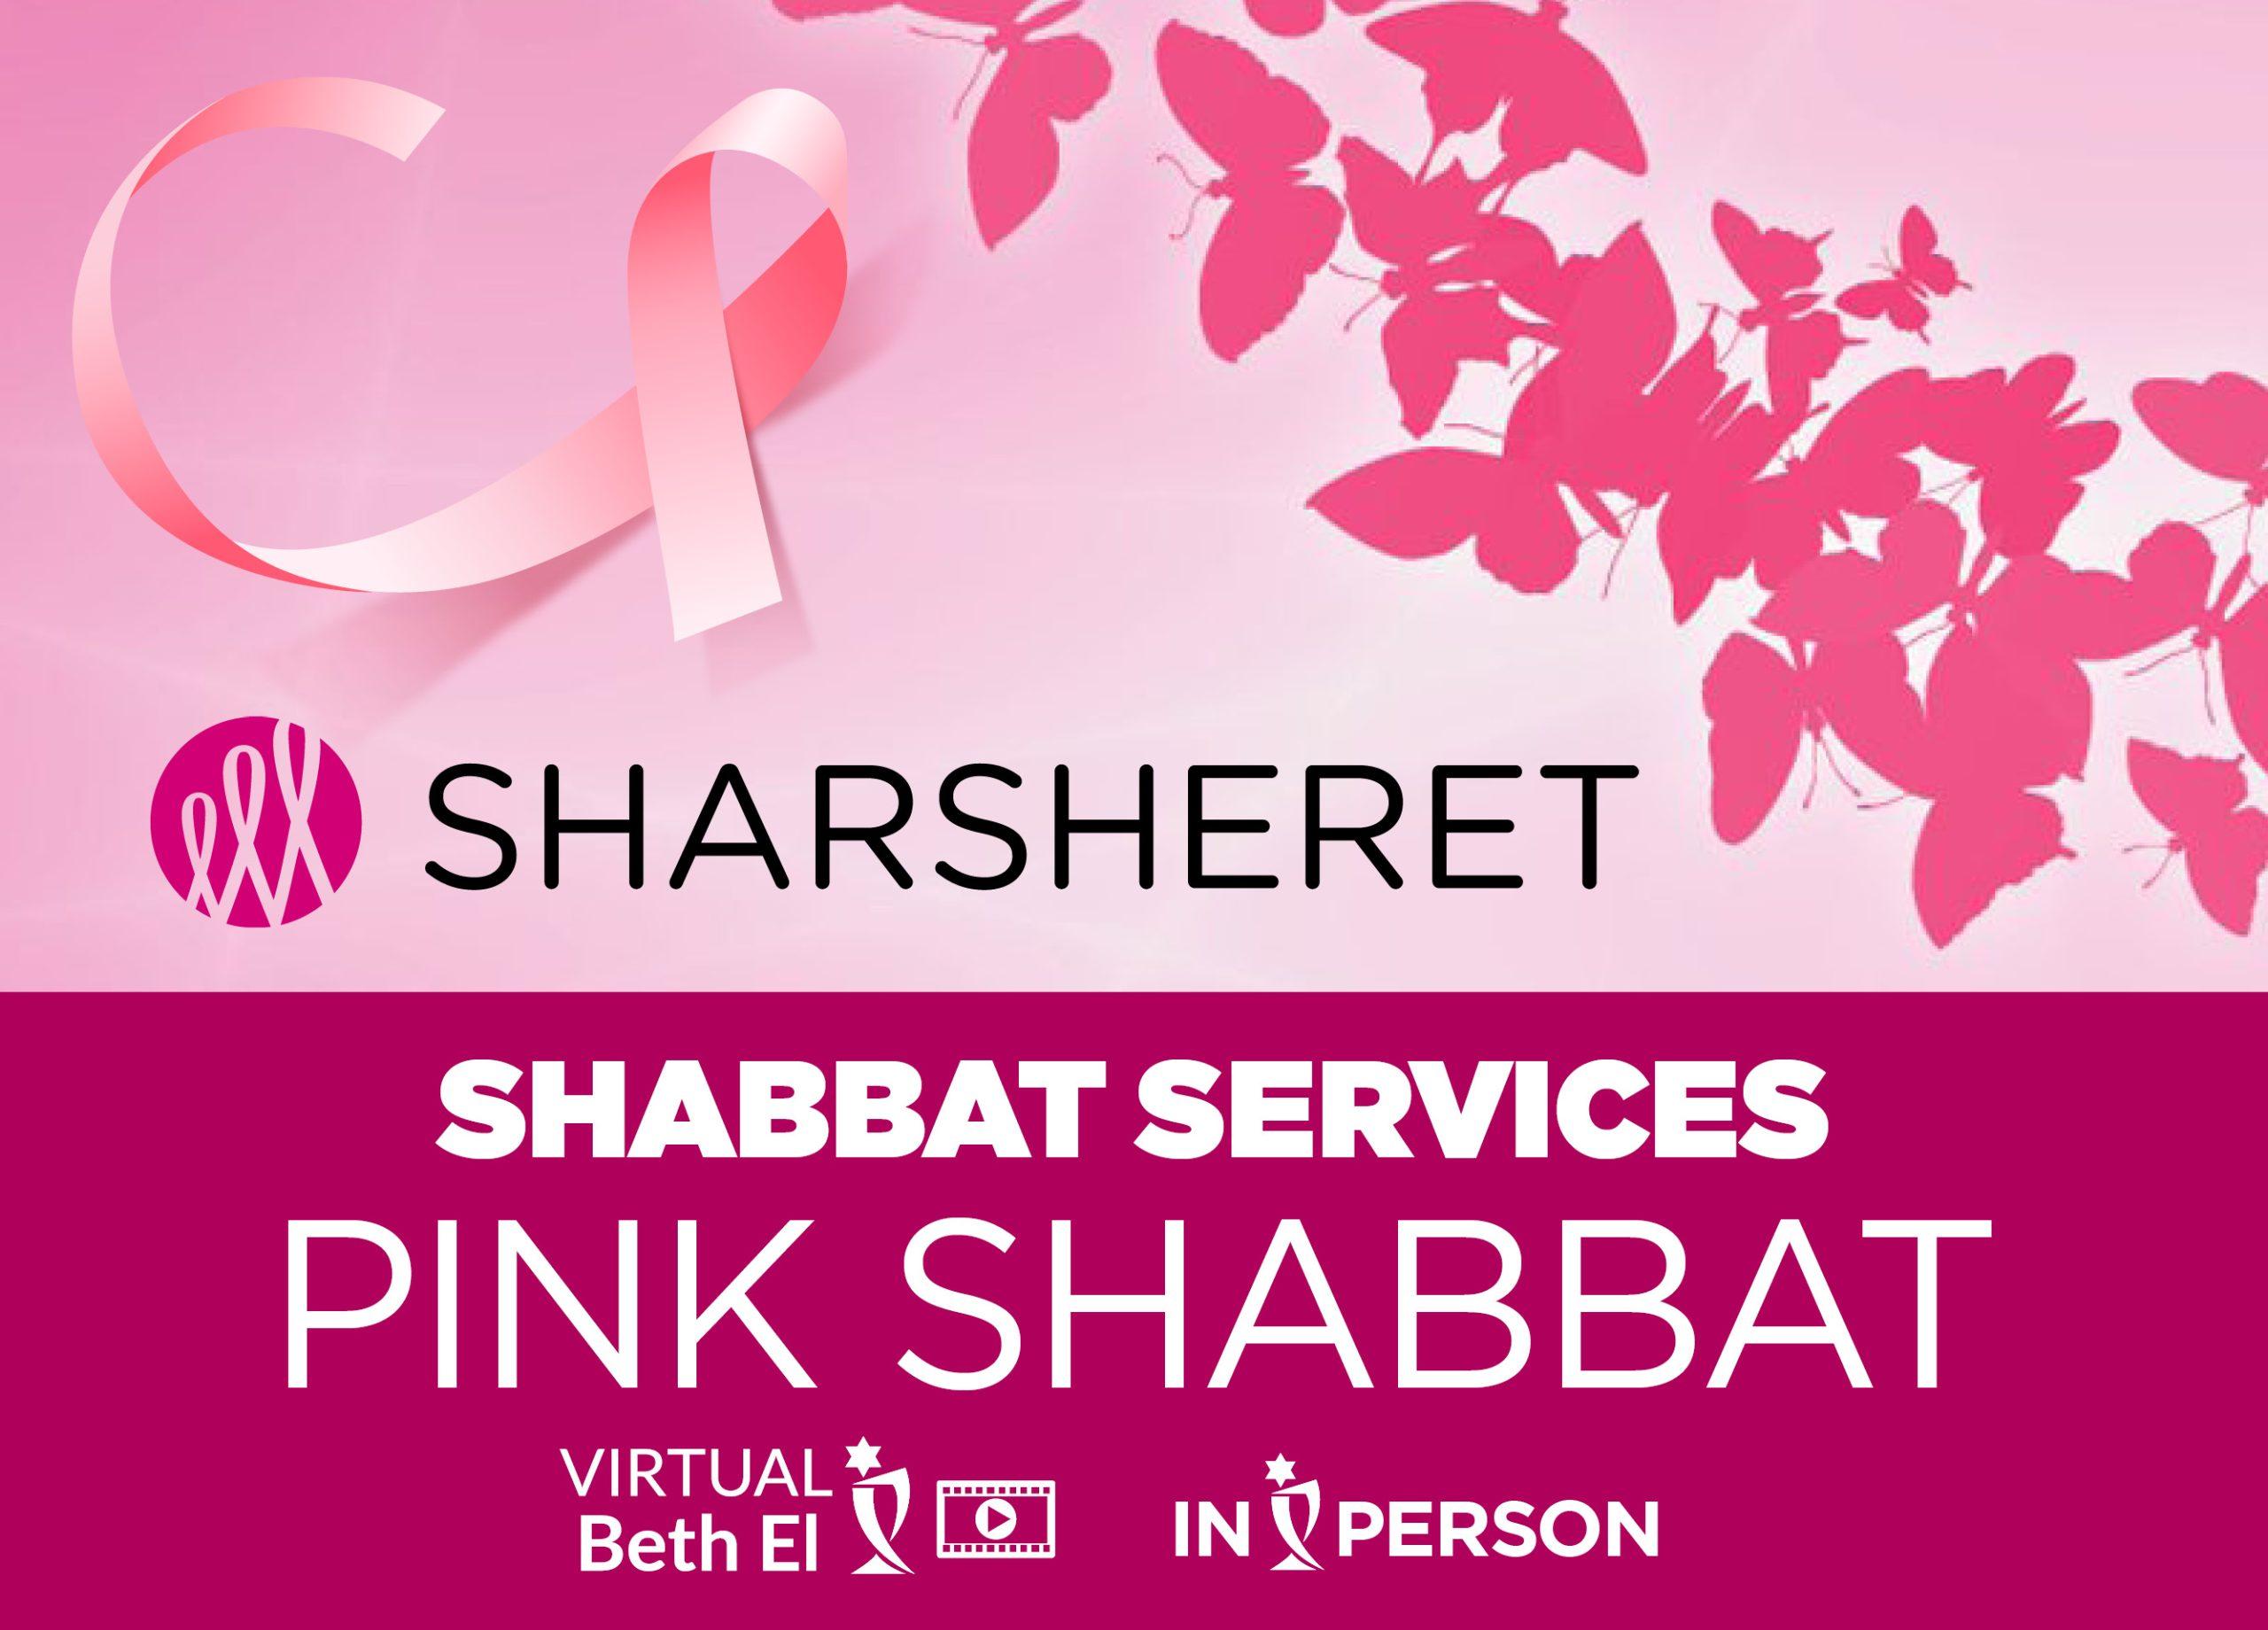 Pink Shabbat event graphic for Temple Beth El of Boca Raton